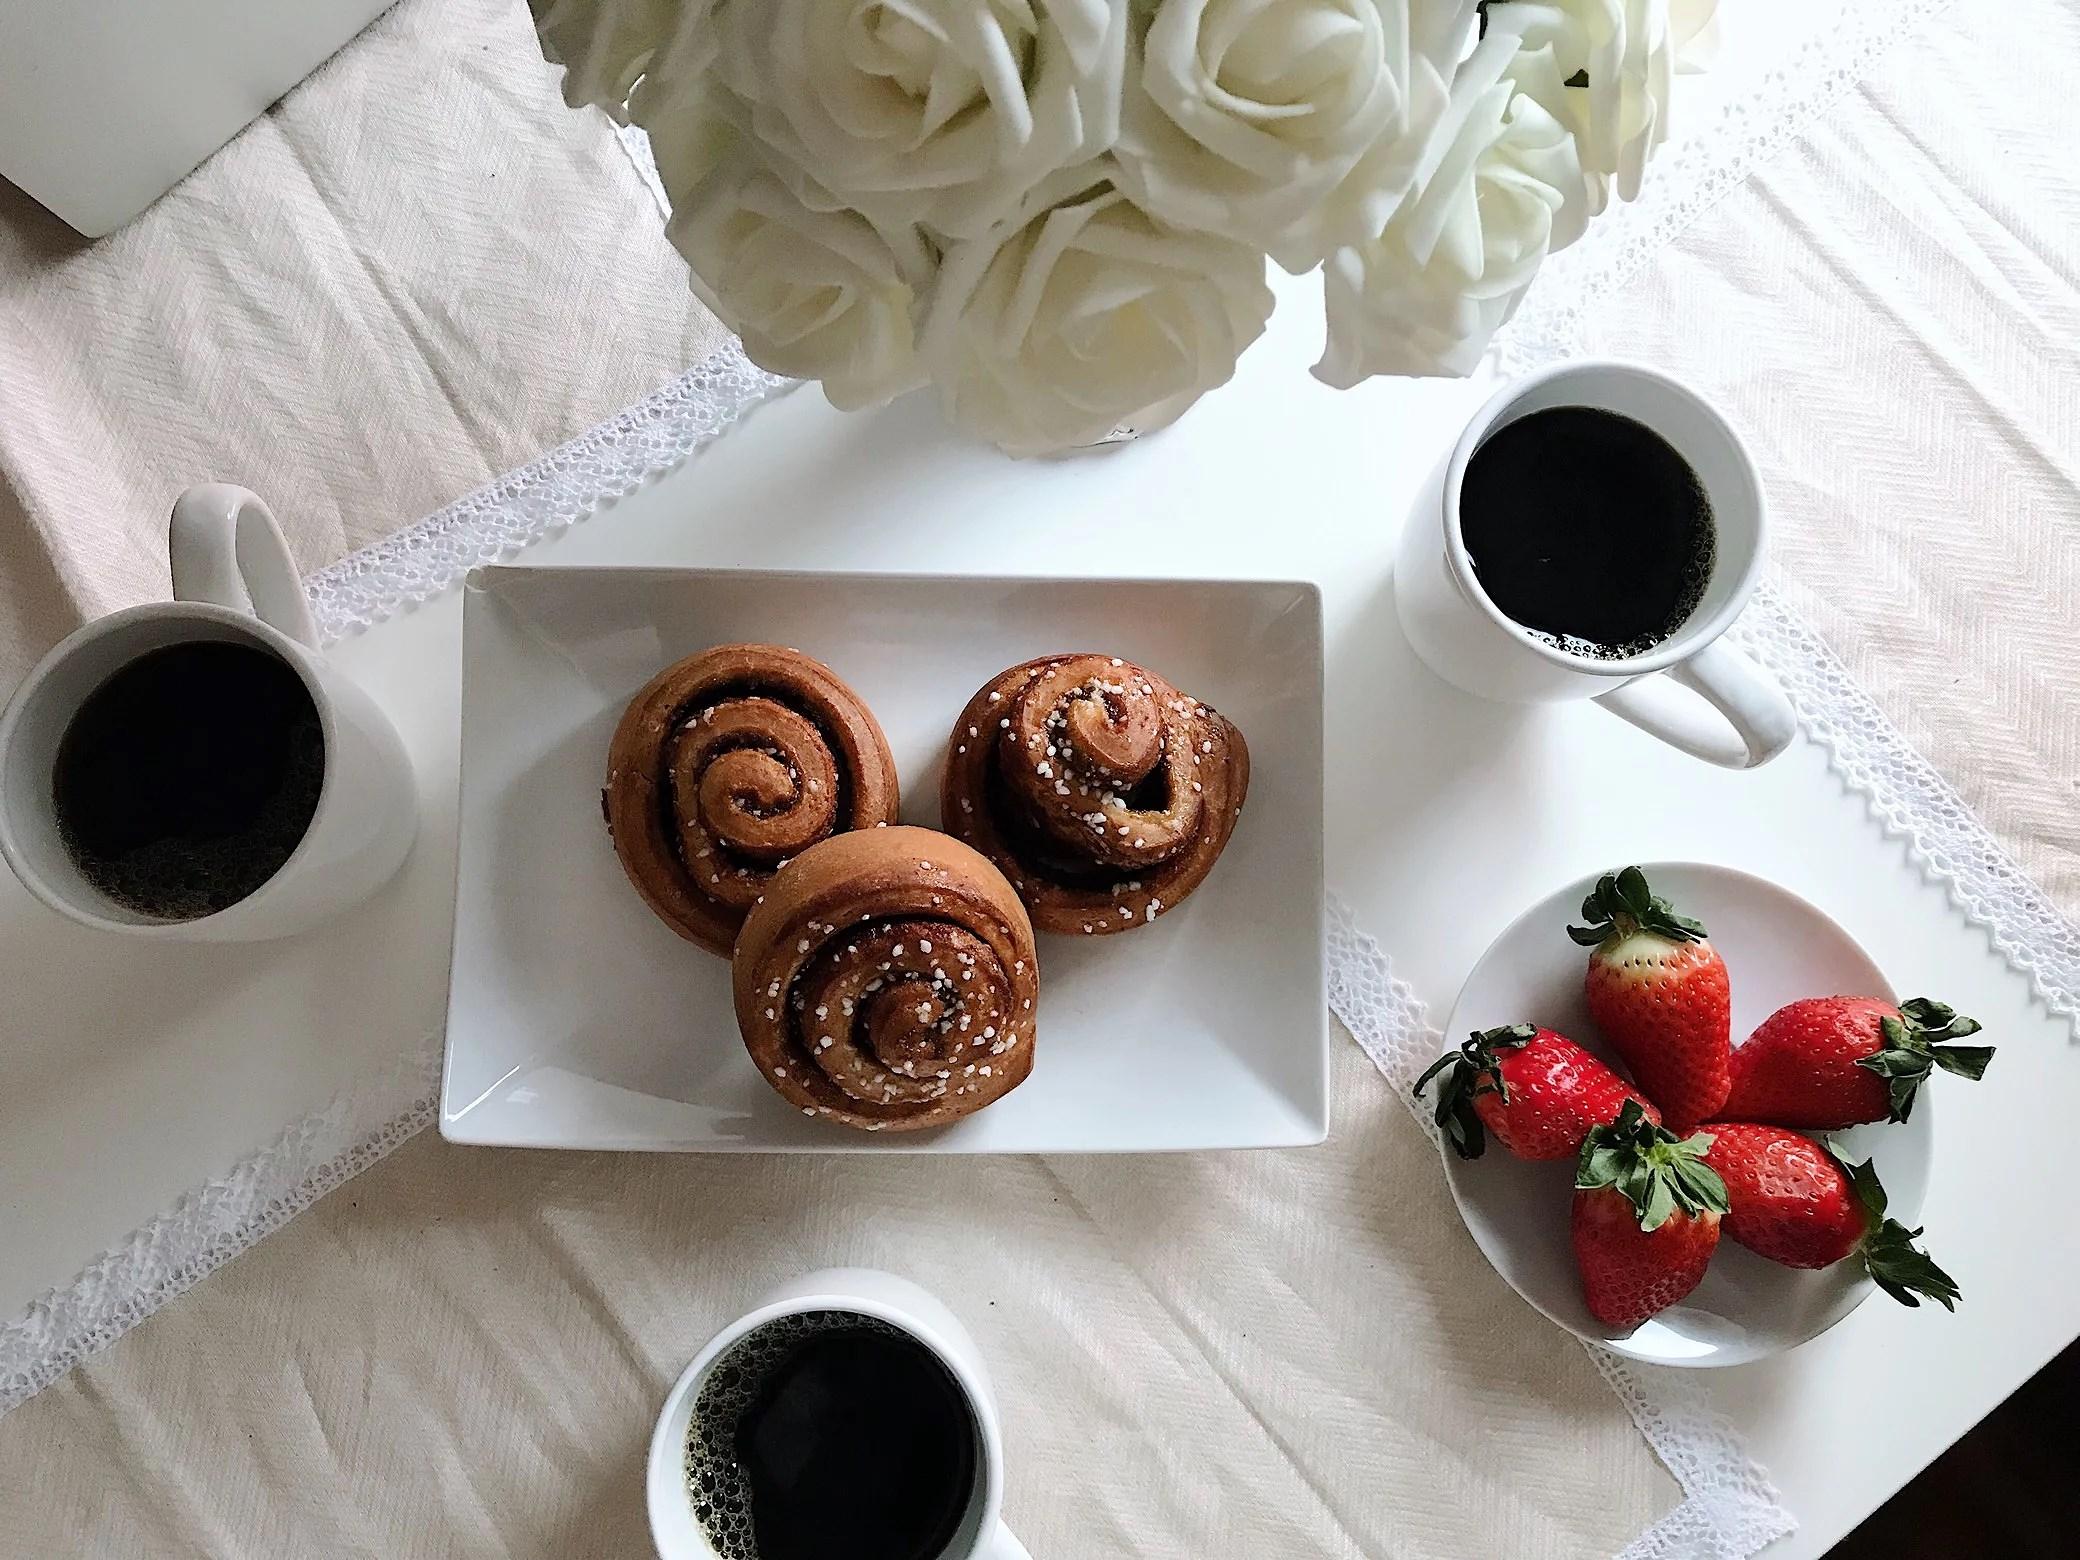 Cinnamon bun & coffee afternoon